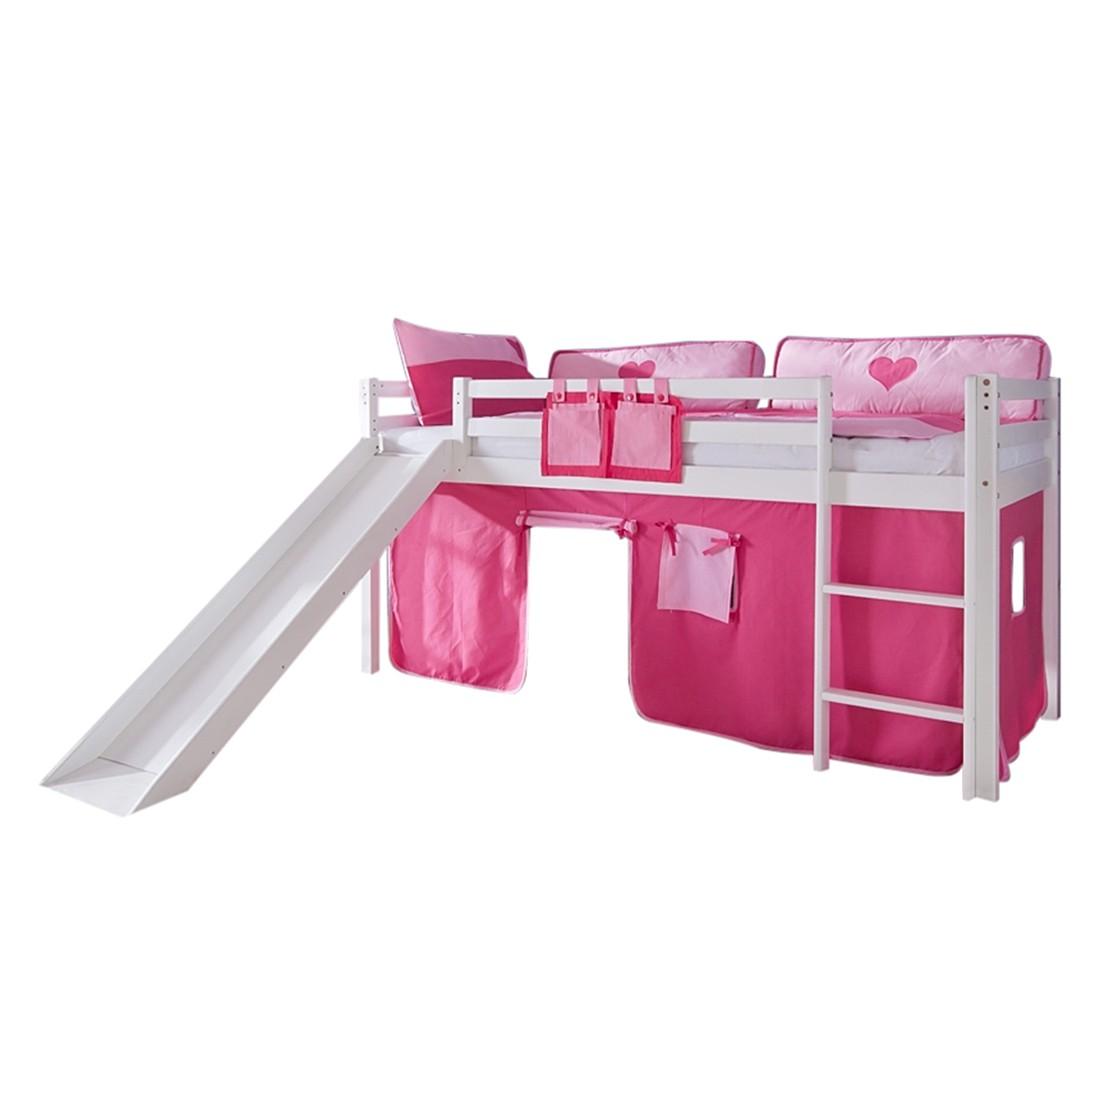 Spielbett Toby - Massivholz Buche Weiß lackiert - mit Rutsche und Textilset - Weiß lackiert mit Textilset pink/rosa ohne Turm, Relita